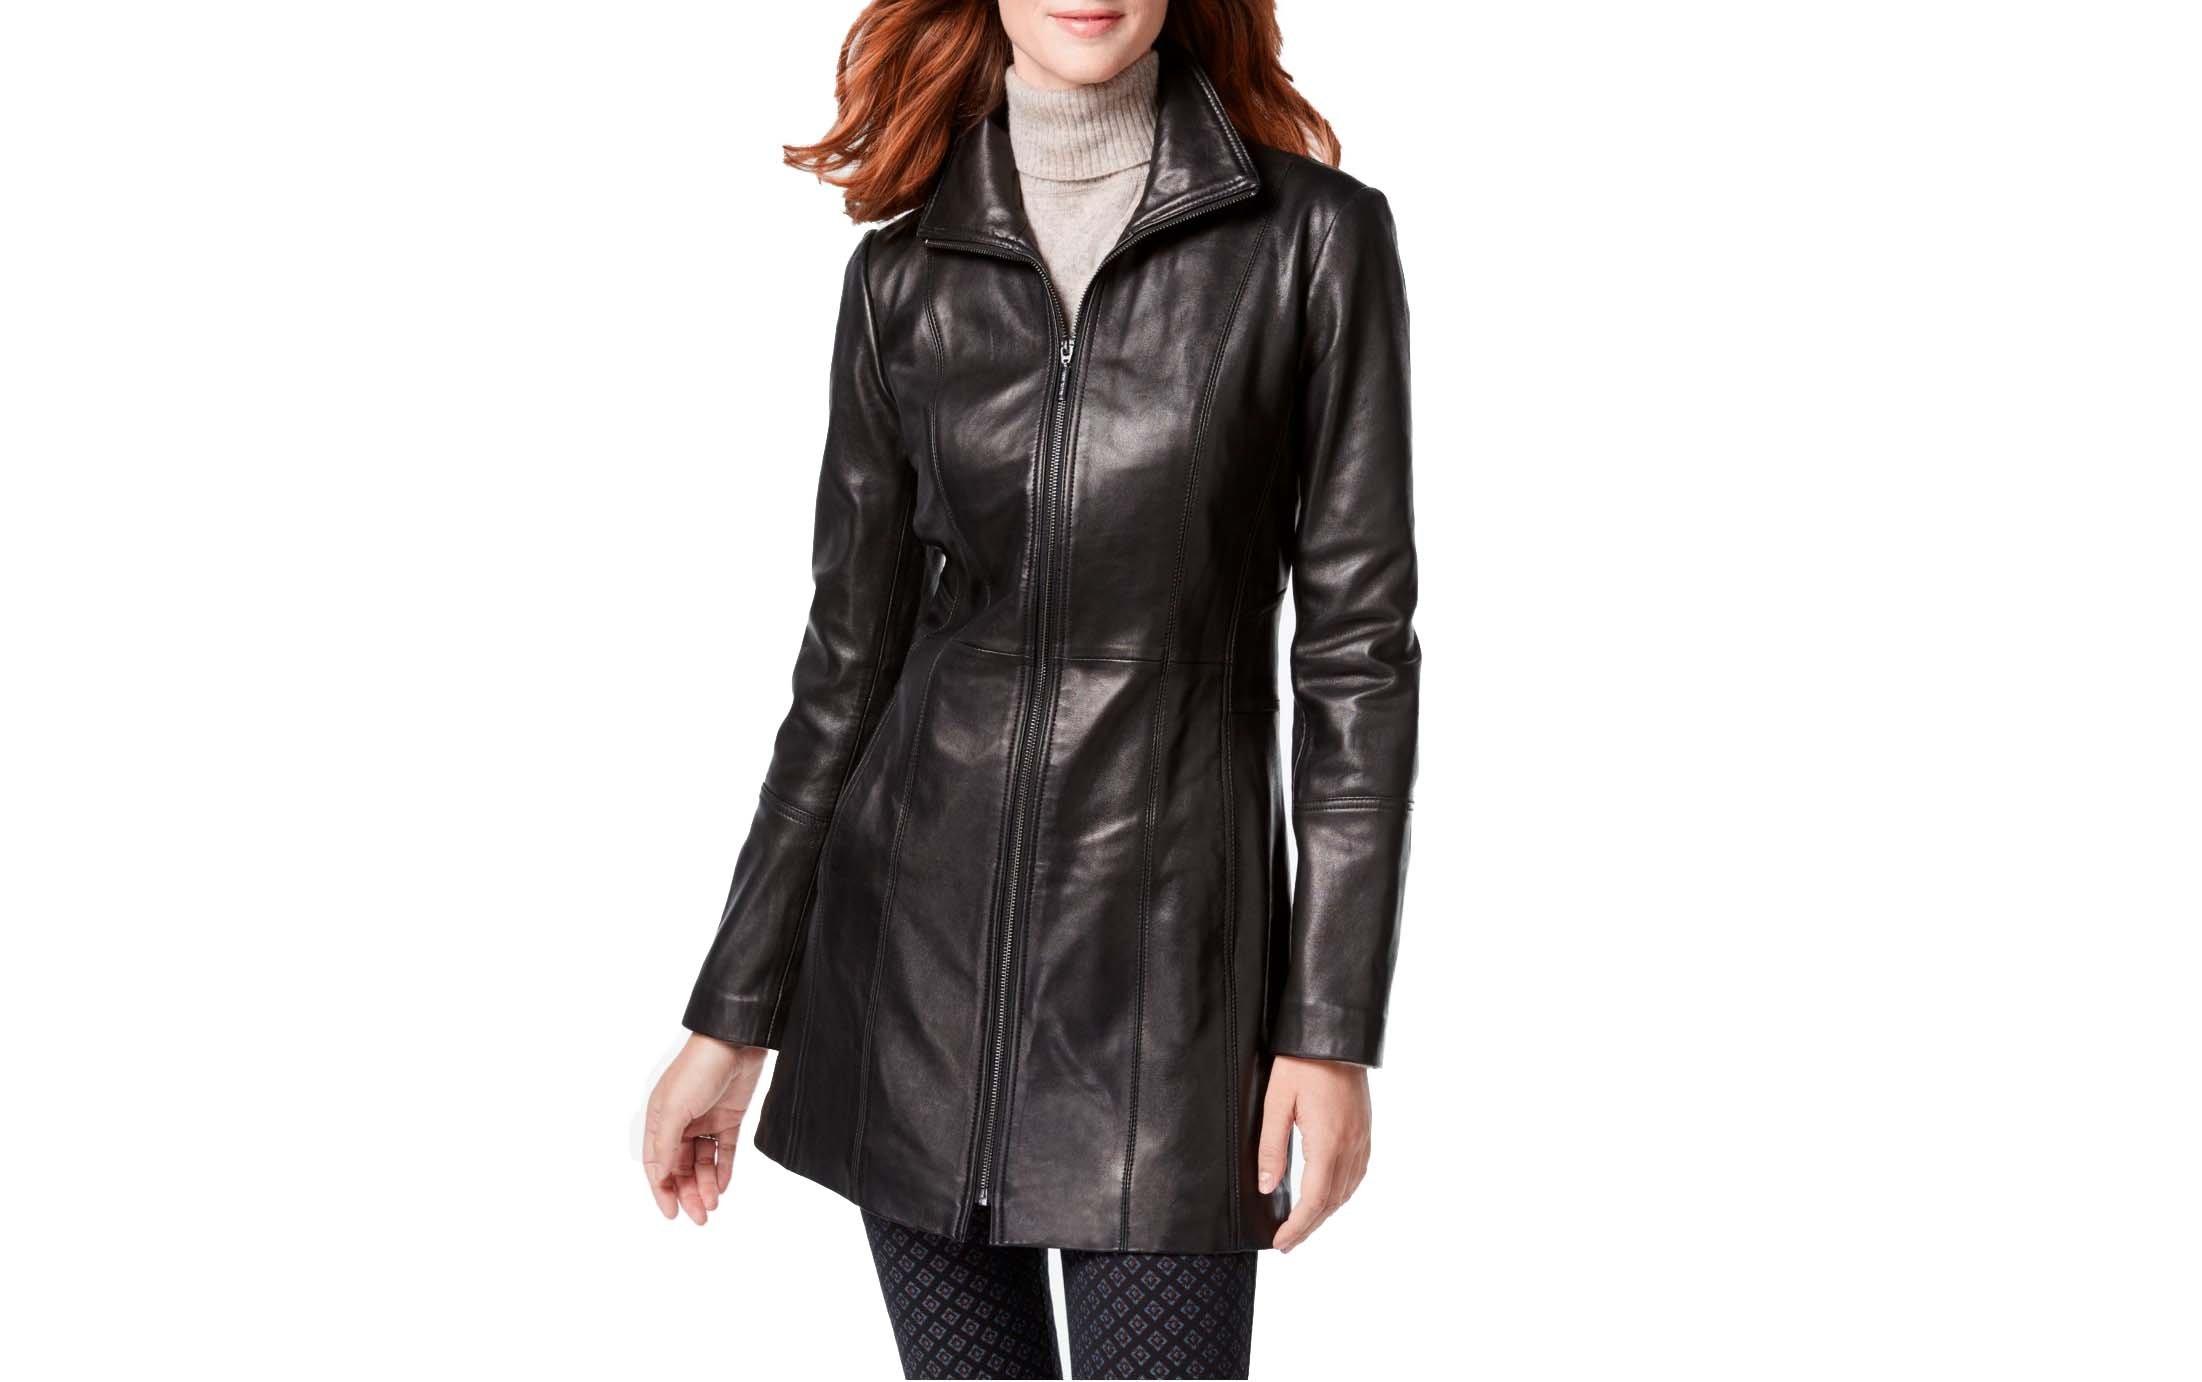 ANNE KLEIN Mid-Length Zip Front Leather Jacket-Black-M by Anne Klein (Image #1)